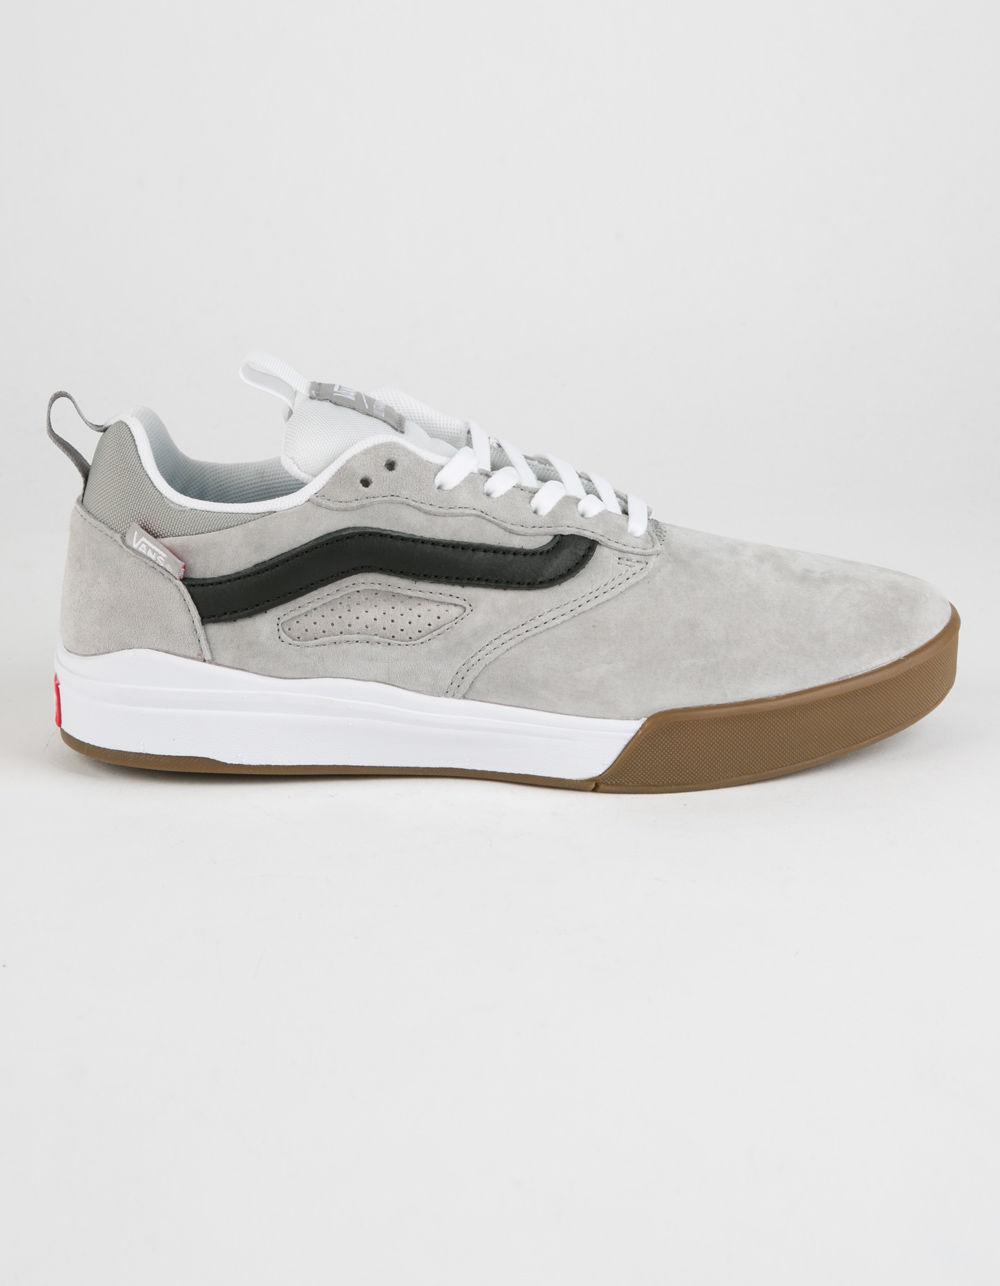 68fb23b5d4c1b2 Lyst - Vans Ultrarange Pro Mens Shoes in Gray for Men